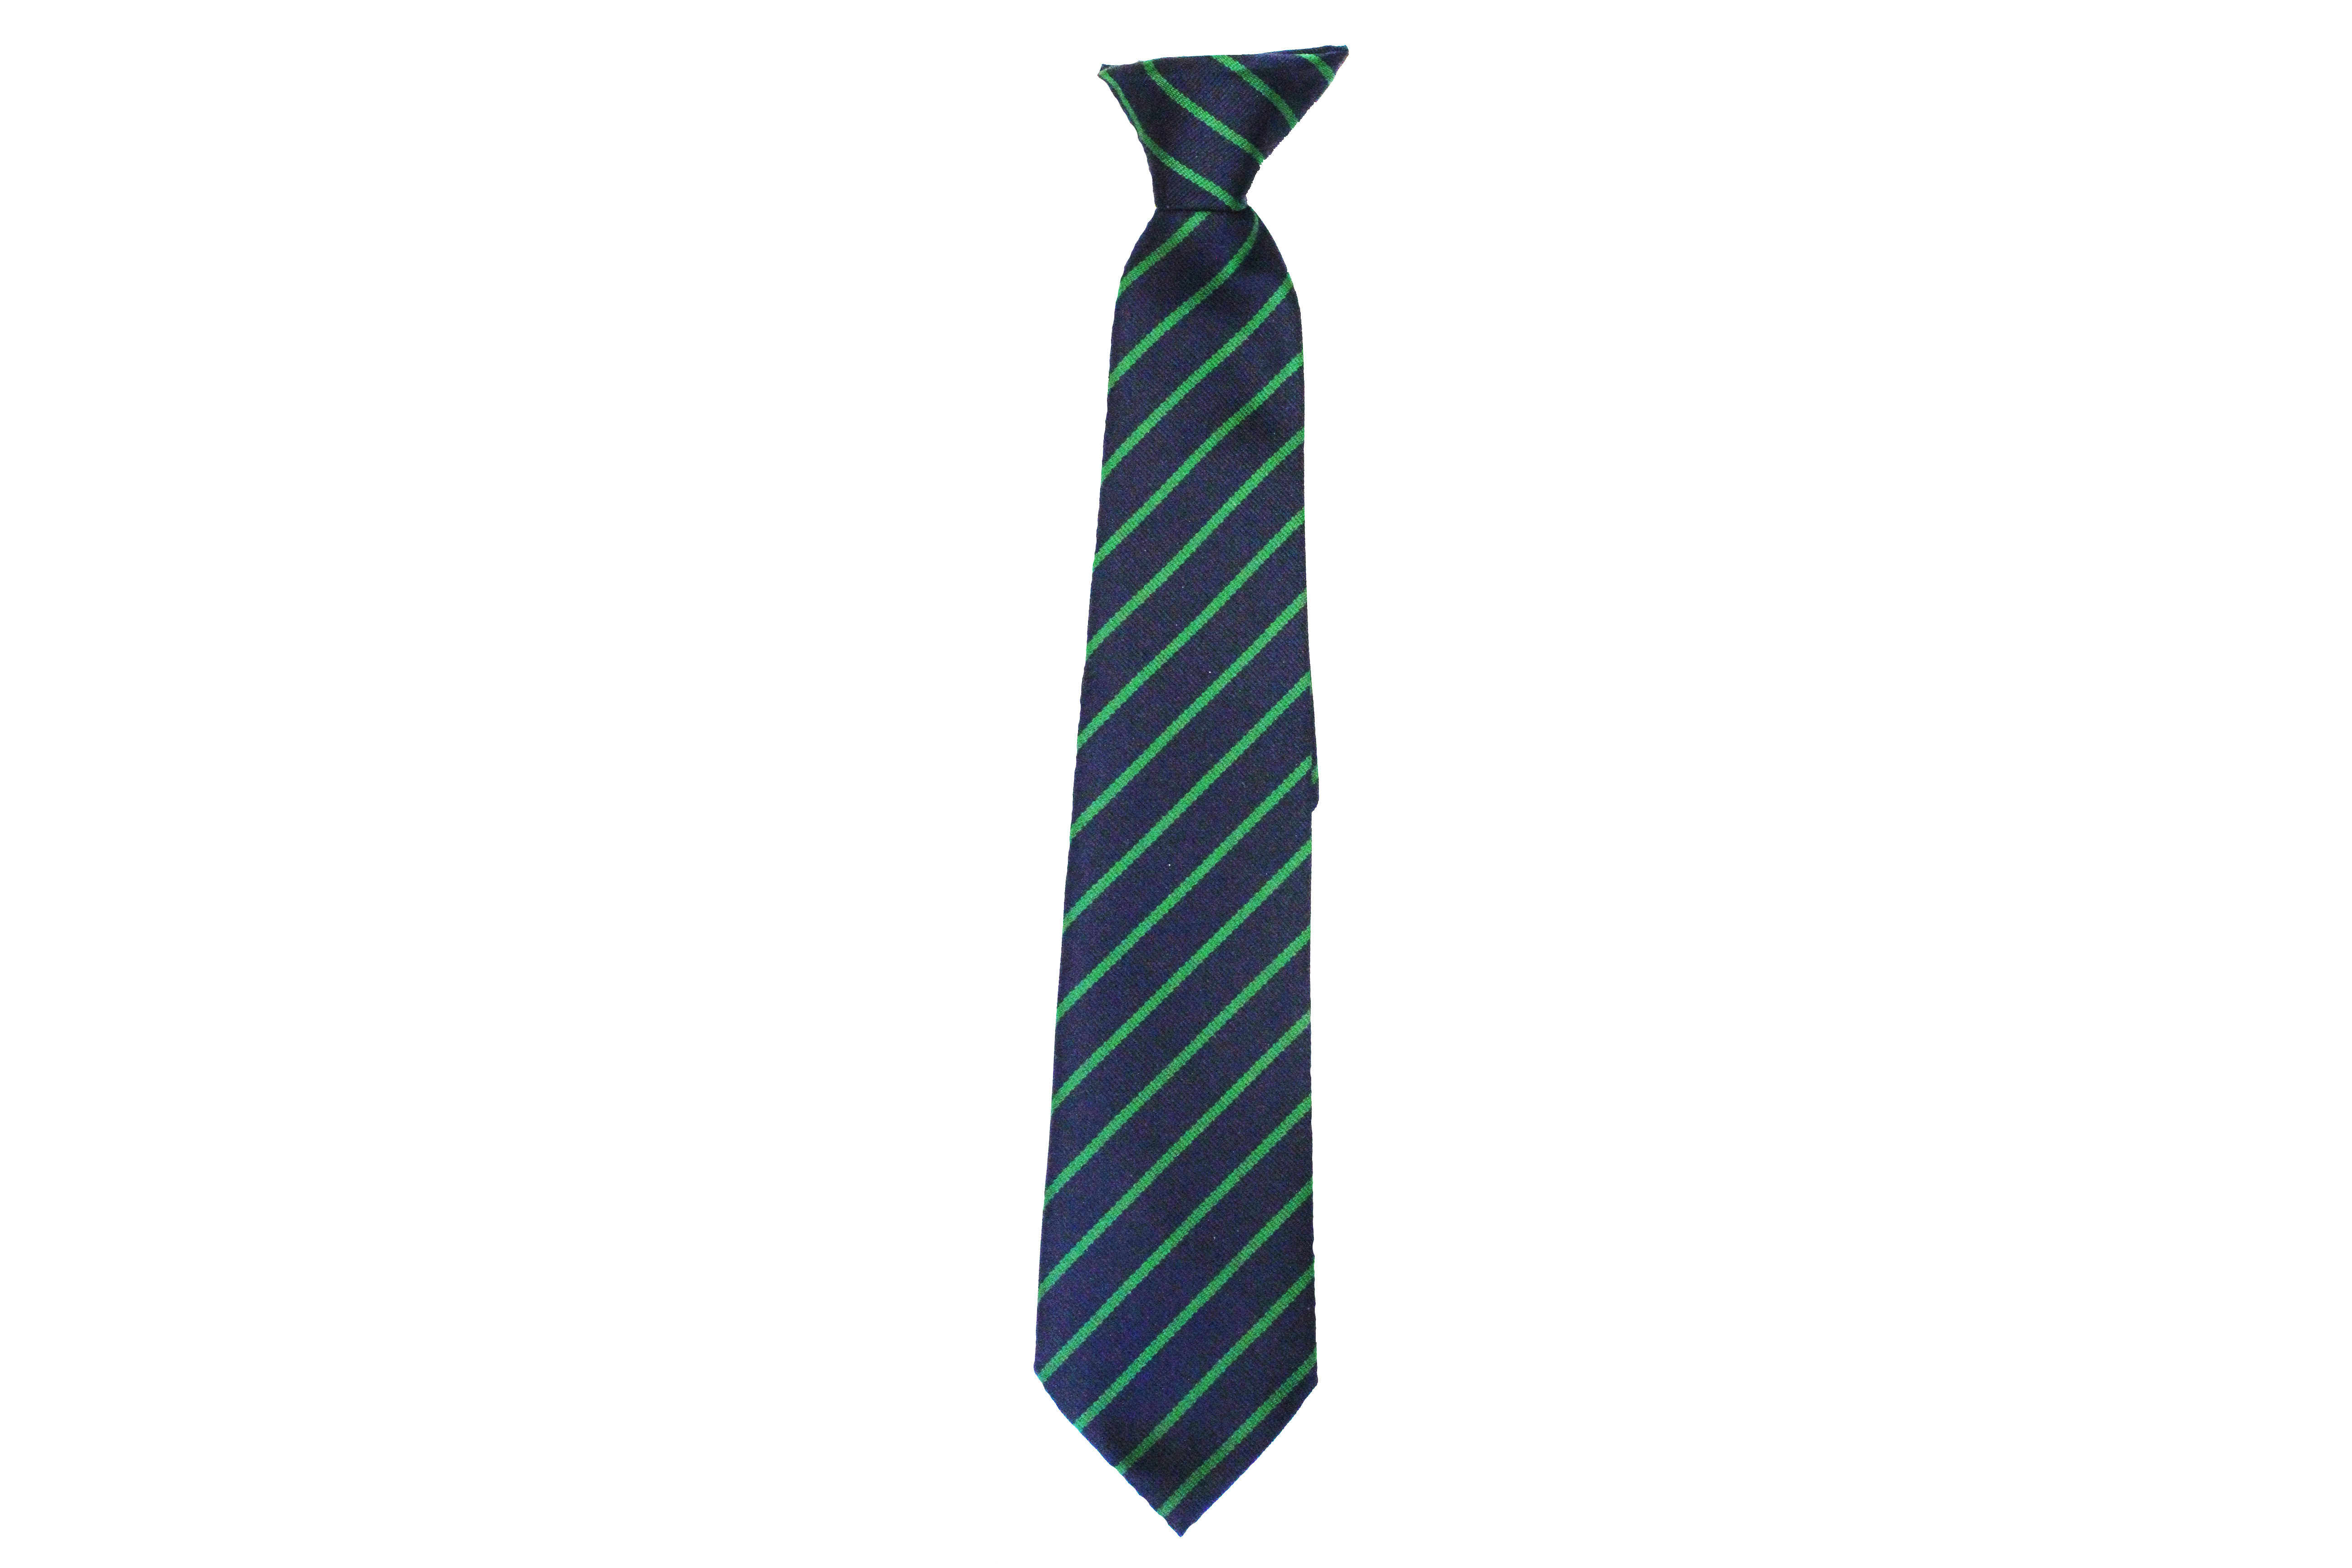 SWRA Tie - Lancer - Green